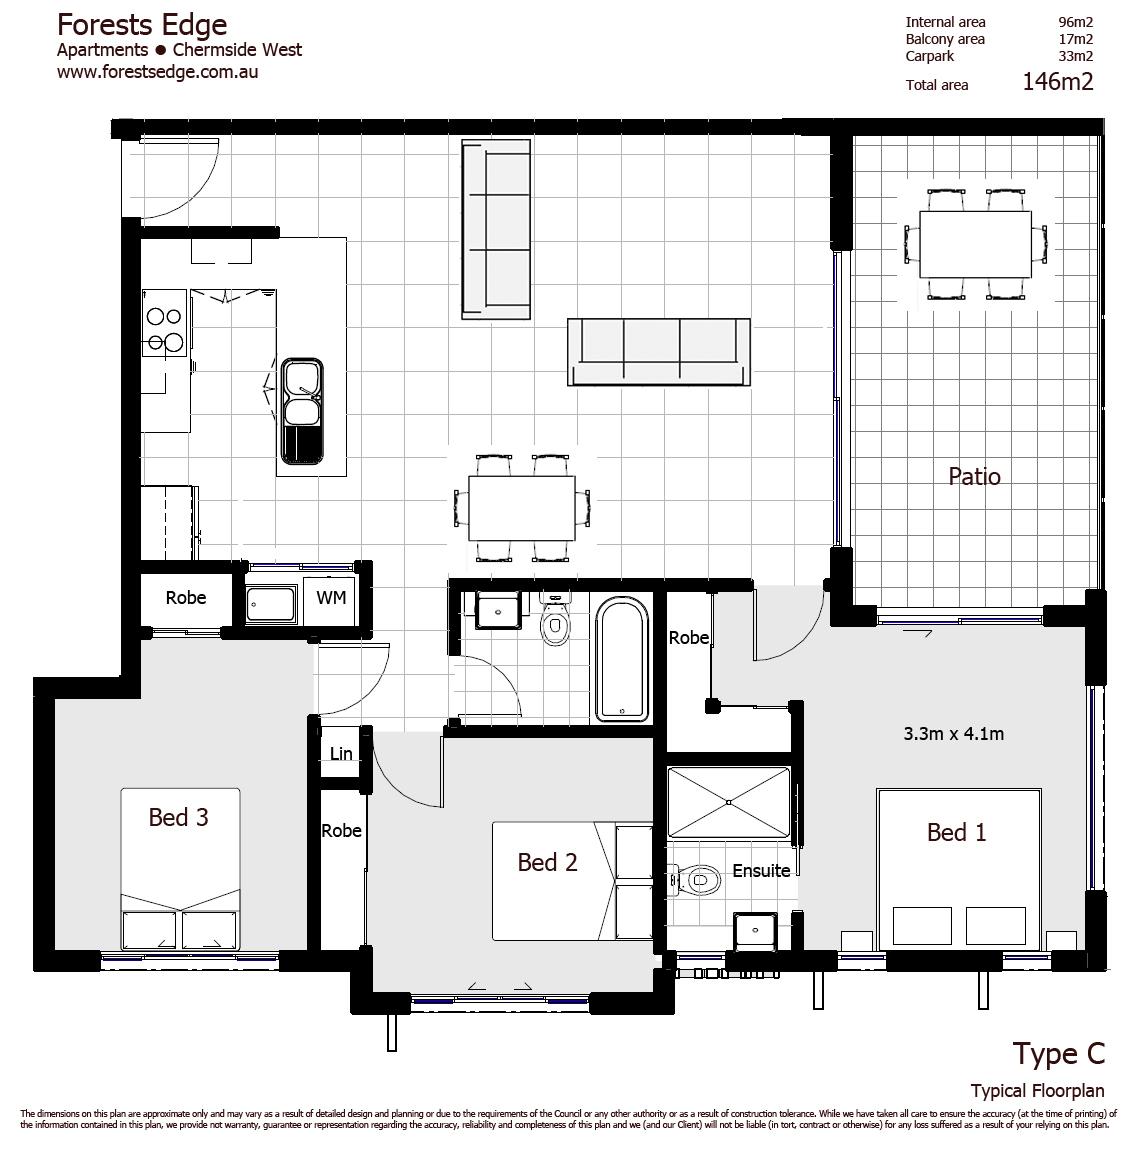 Type C Floorplan - 3 Bed Apartment copy.jpg